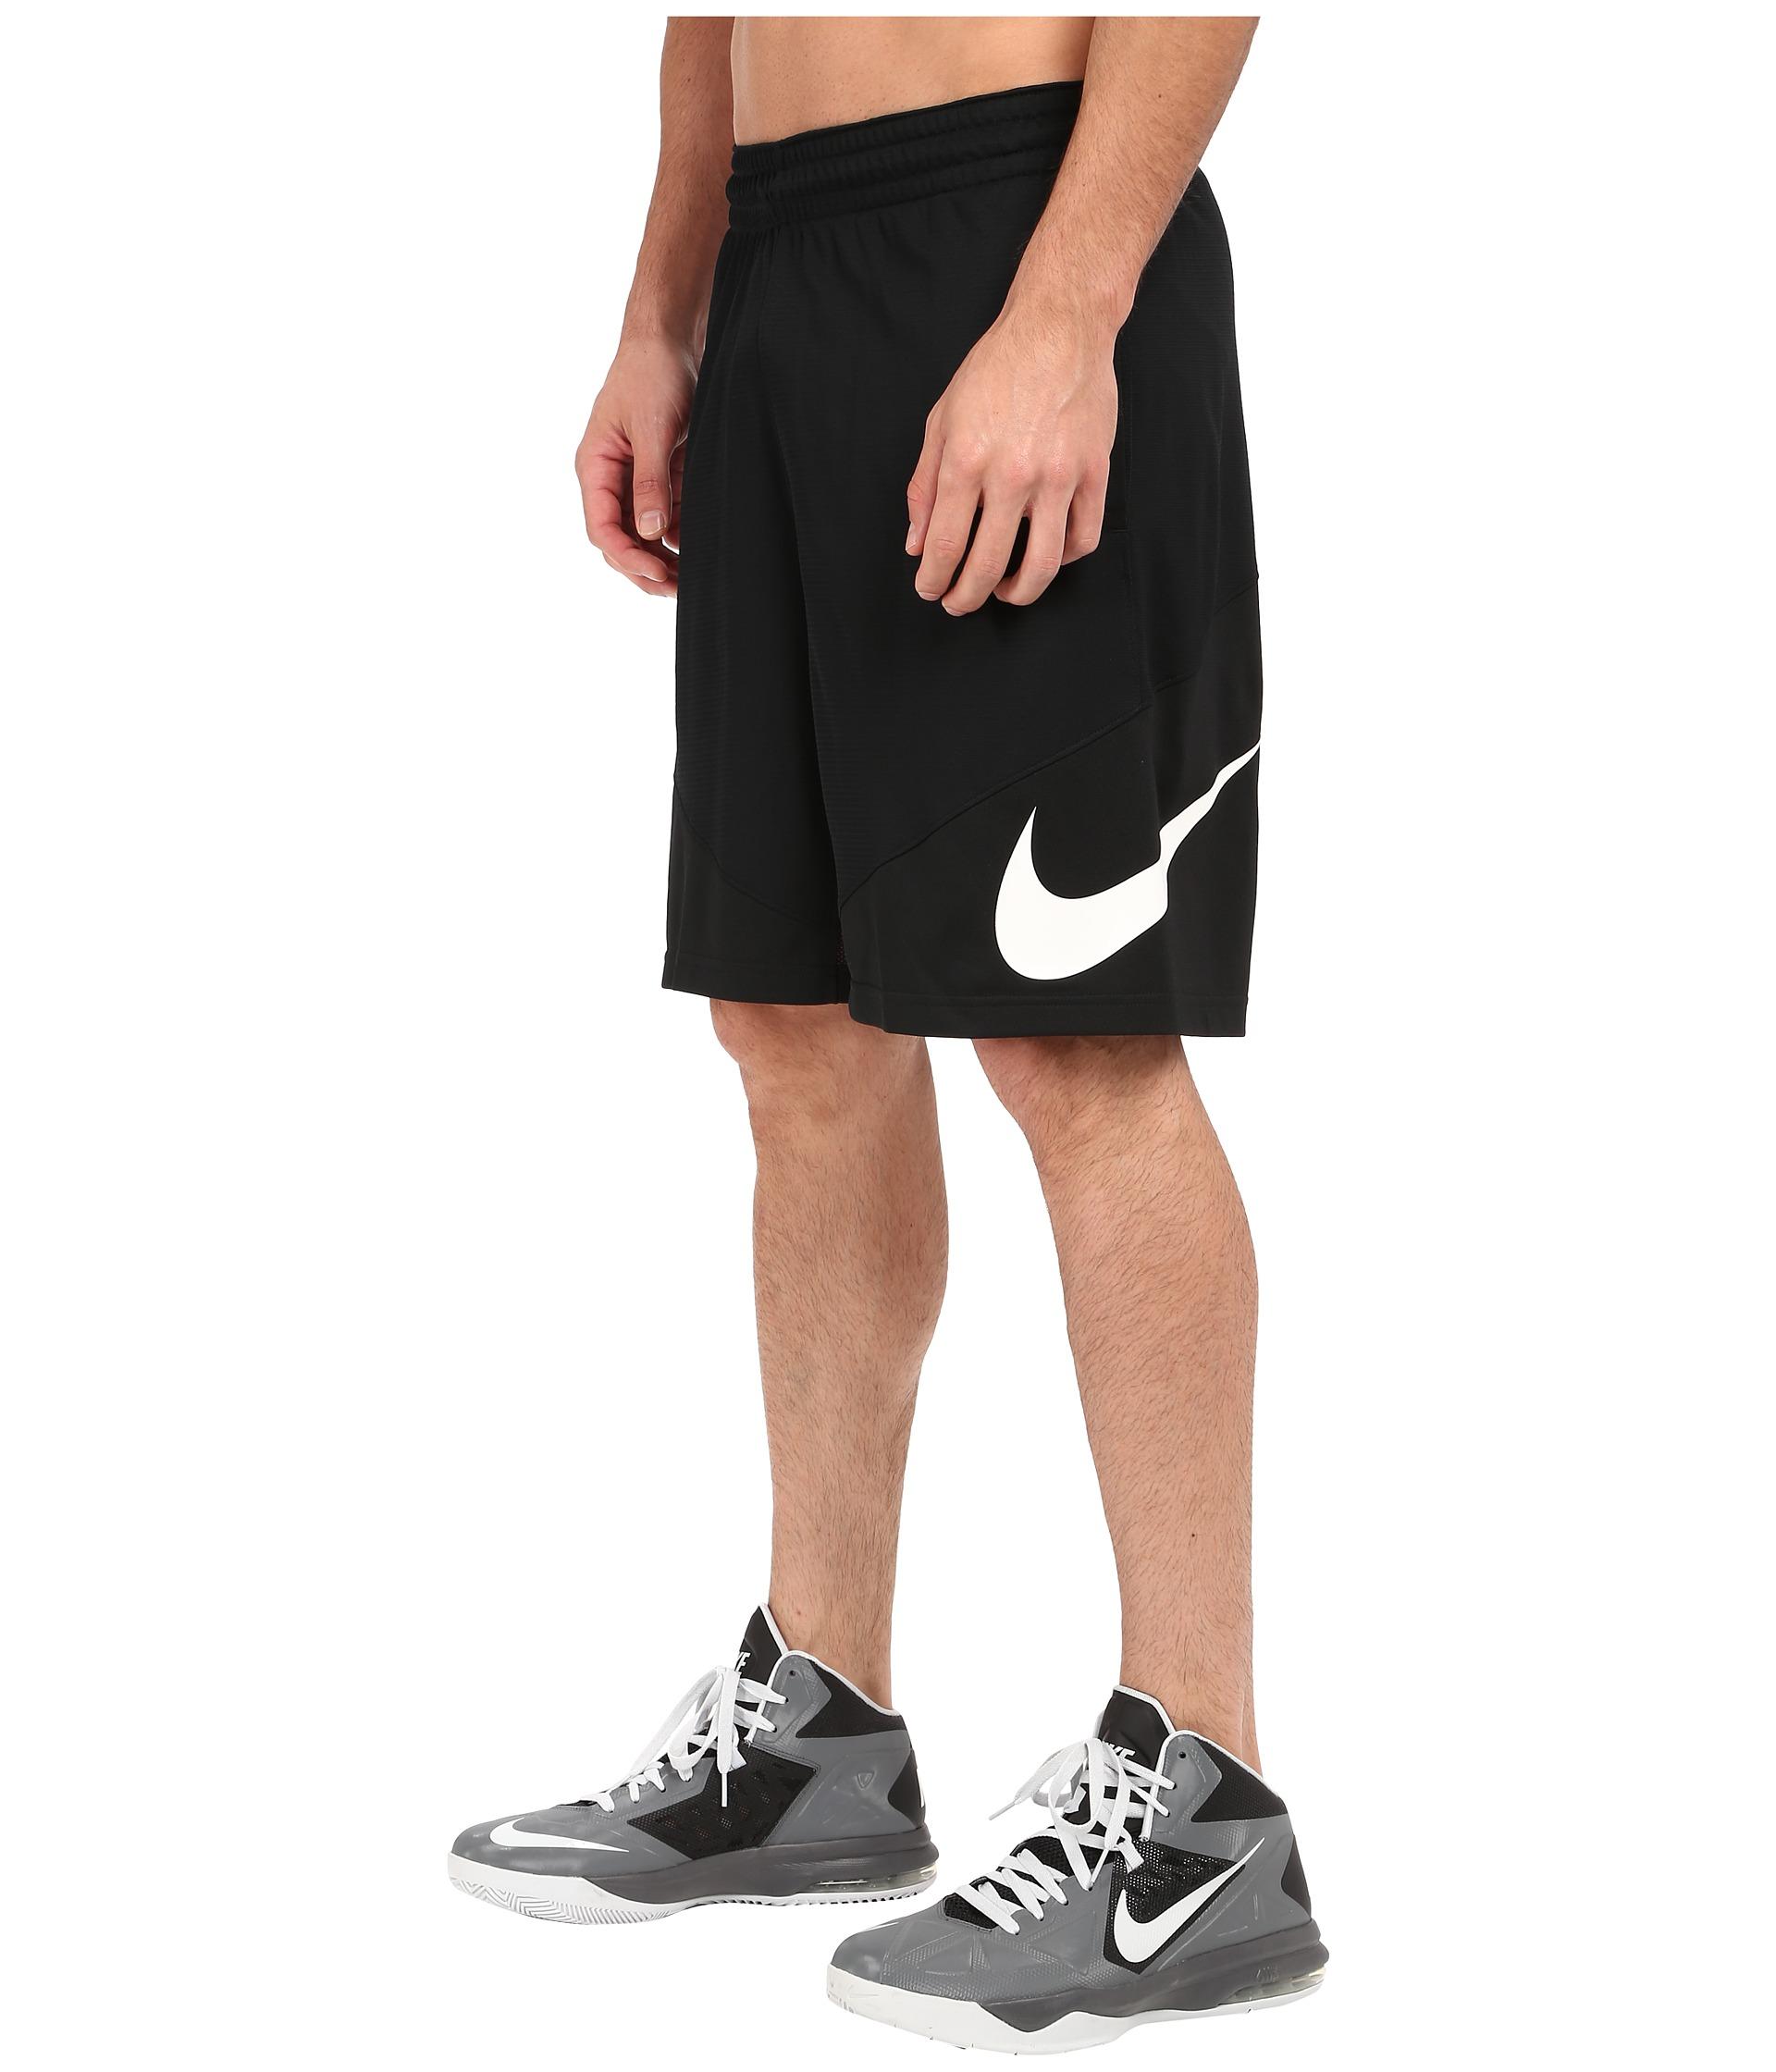 Nike HBR Shorts - Zappos.com Free Shipping BOTH Ways